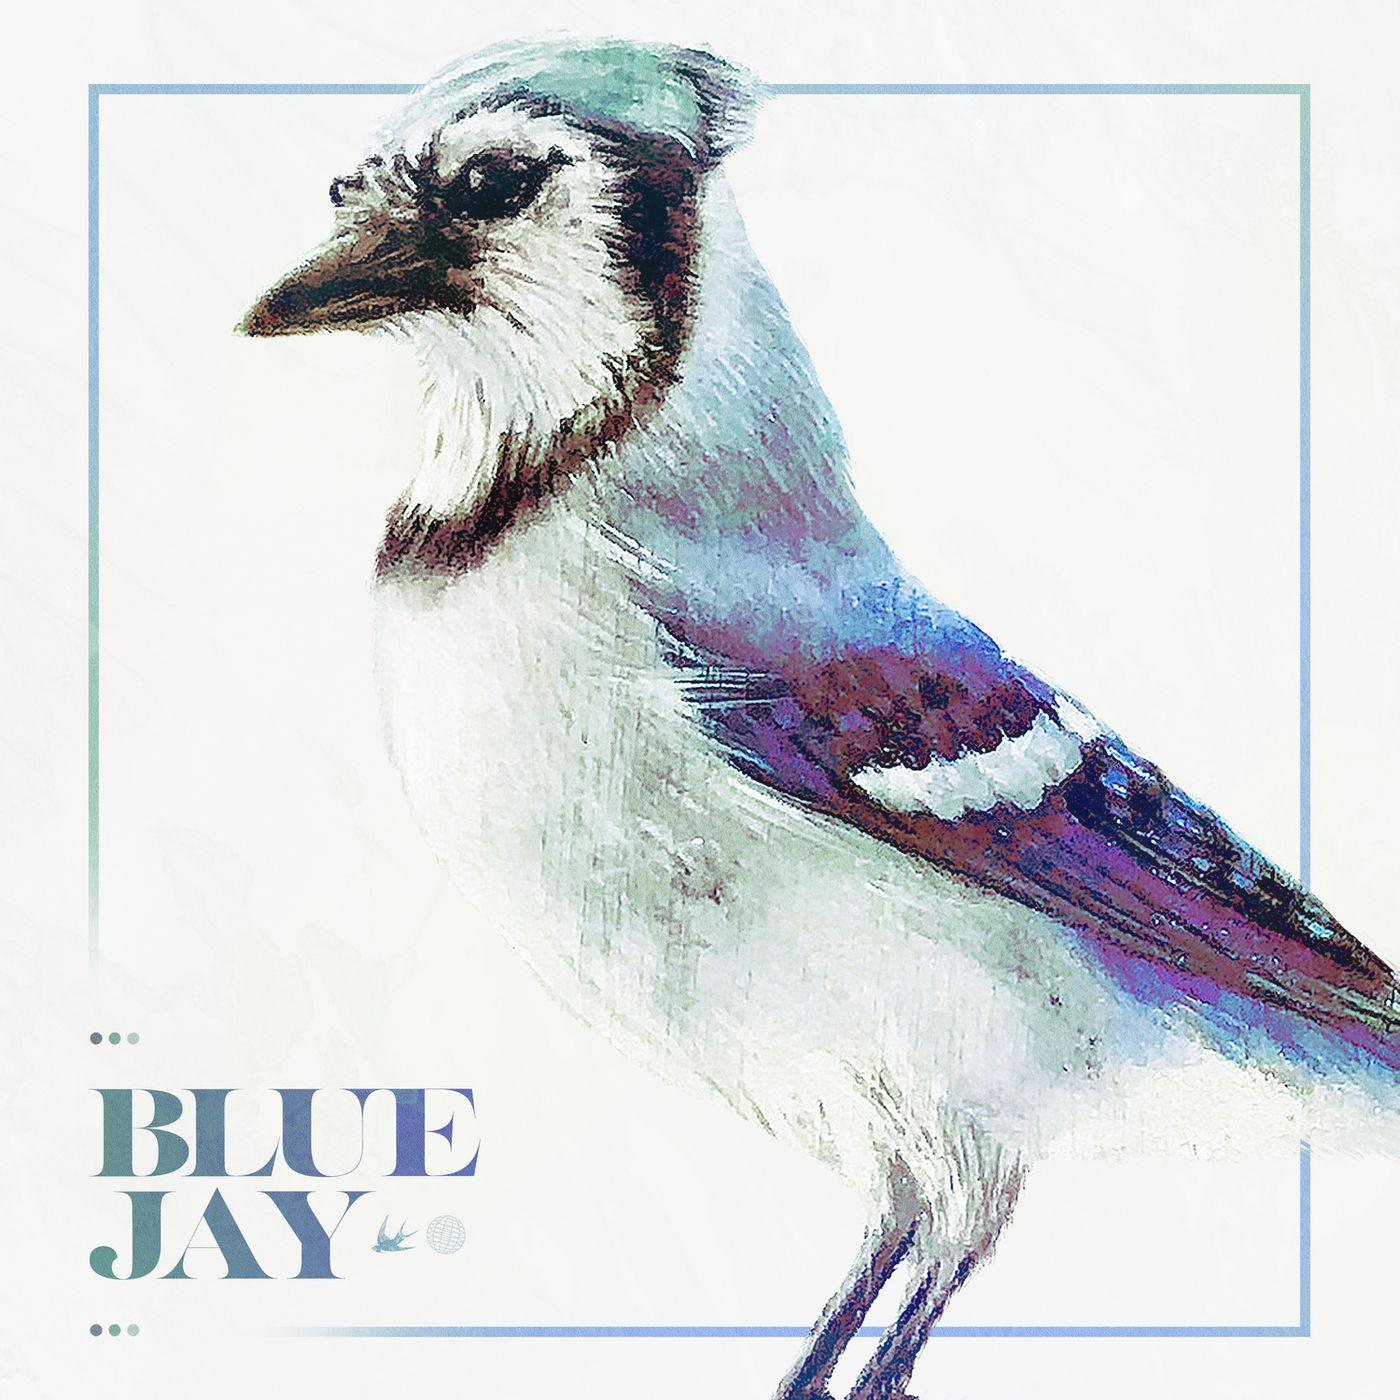 Nomvdic - Blue Jay [single] (2020)